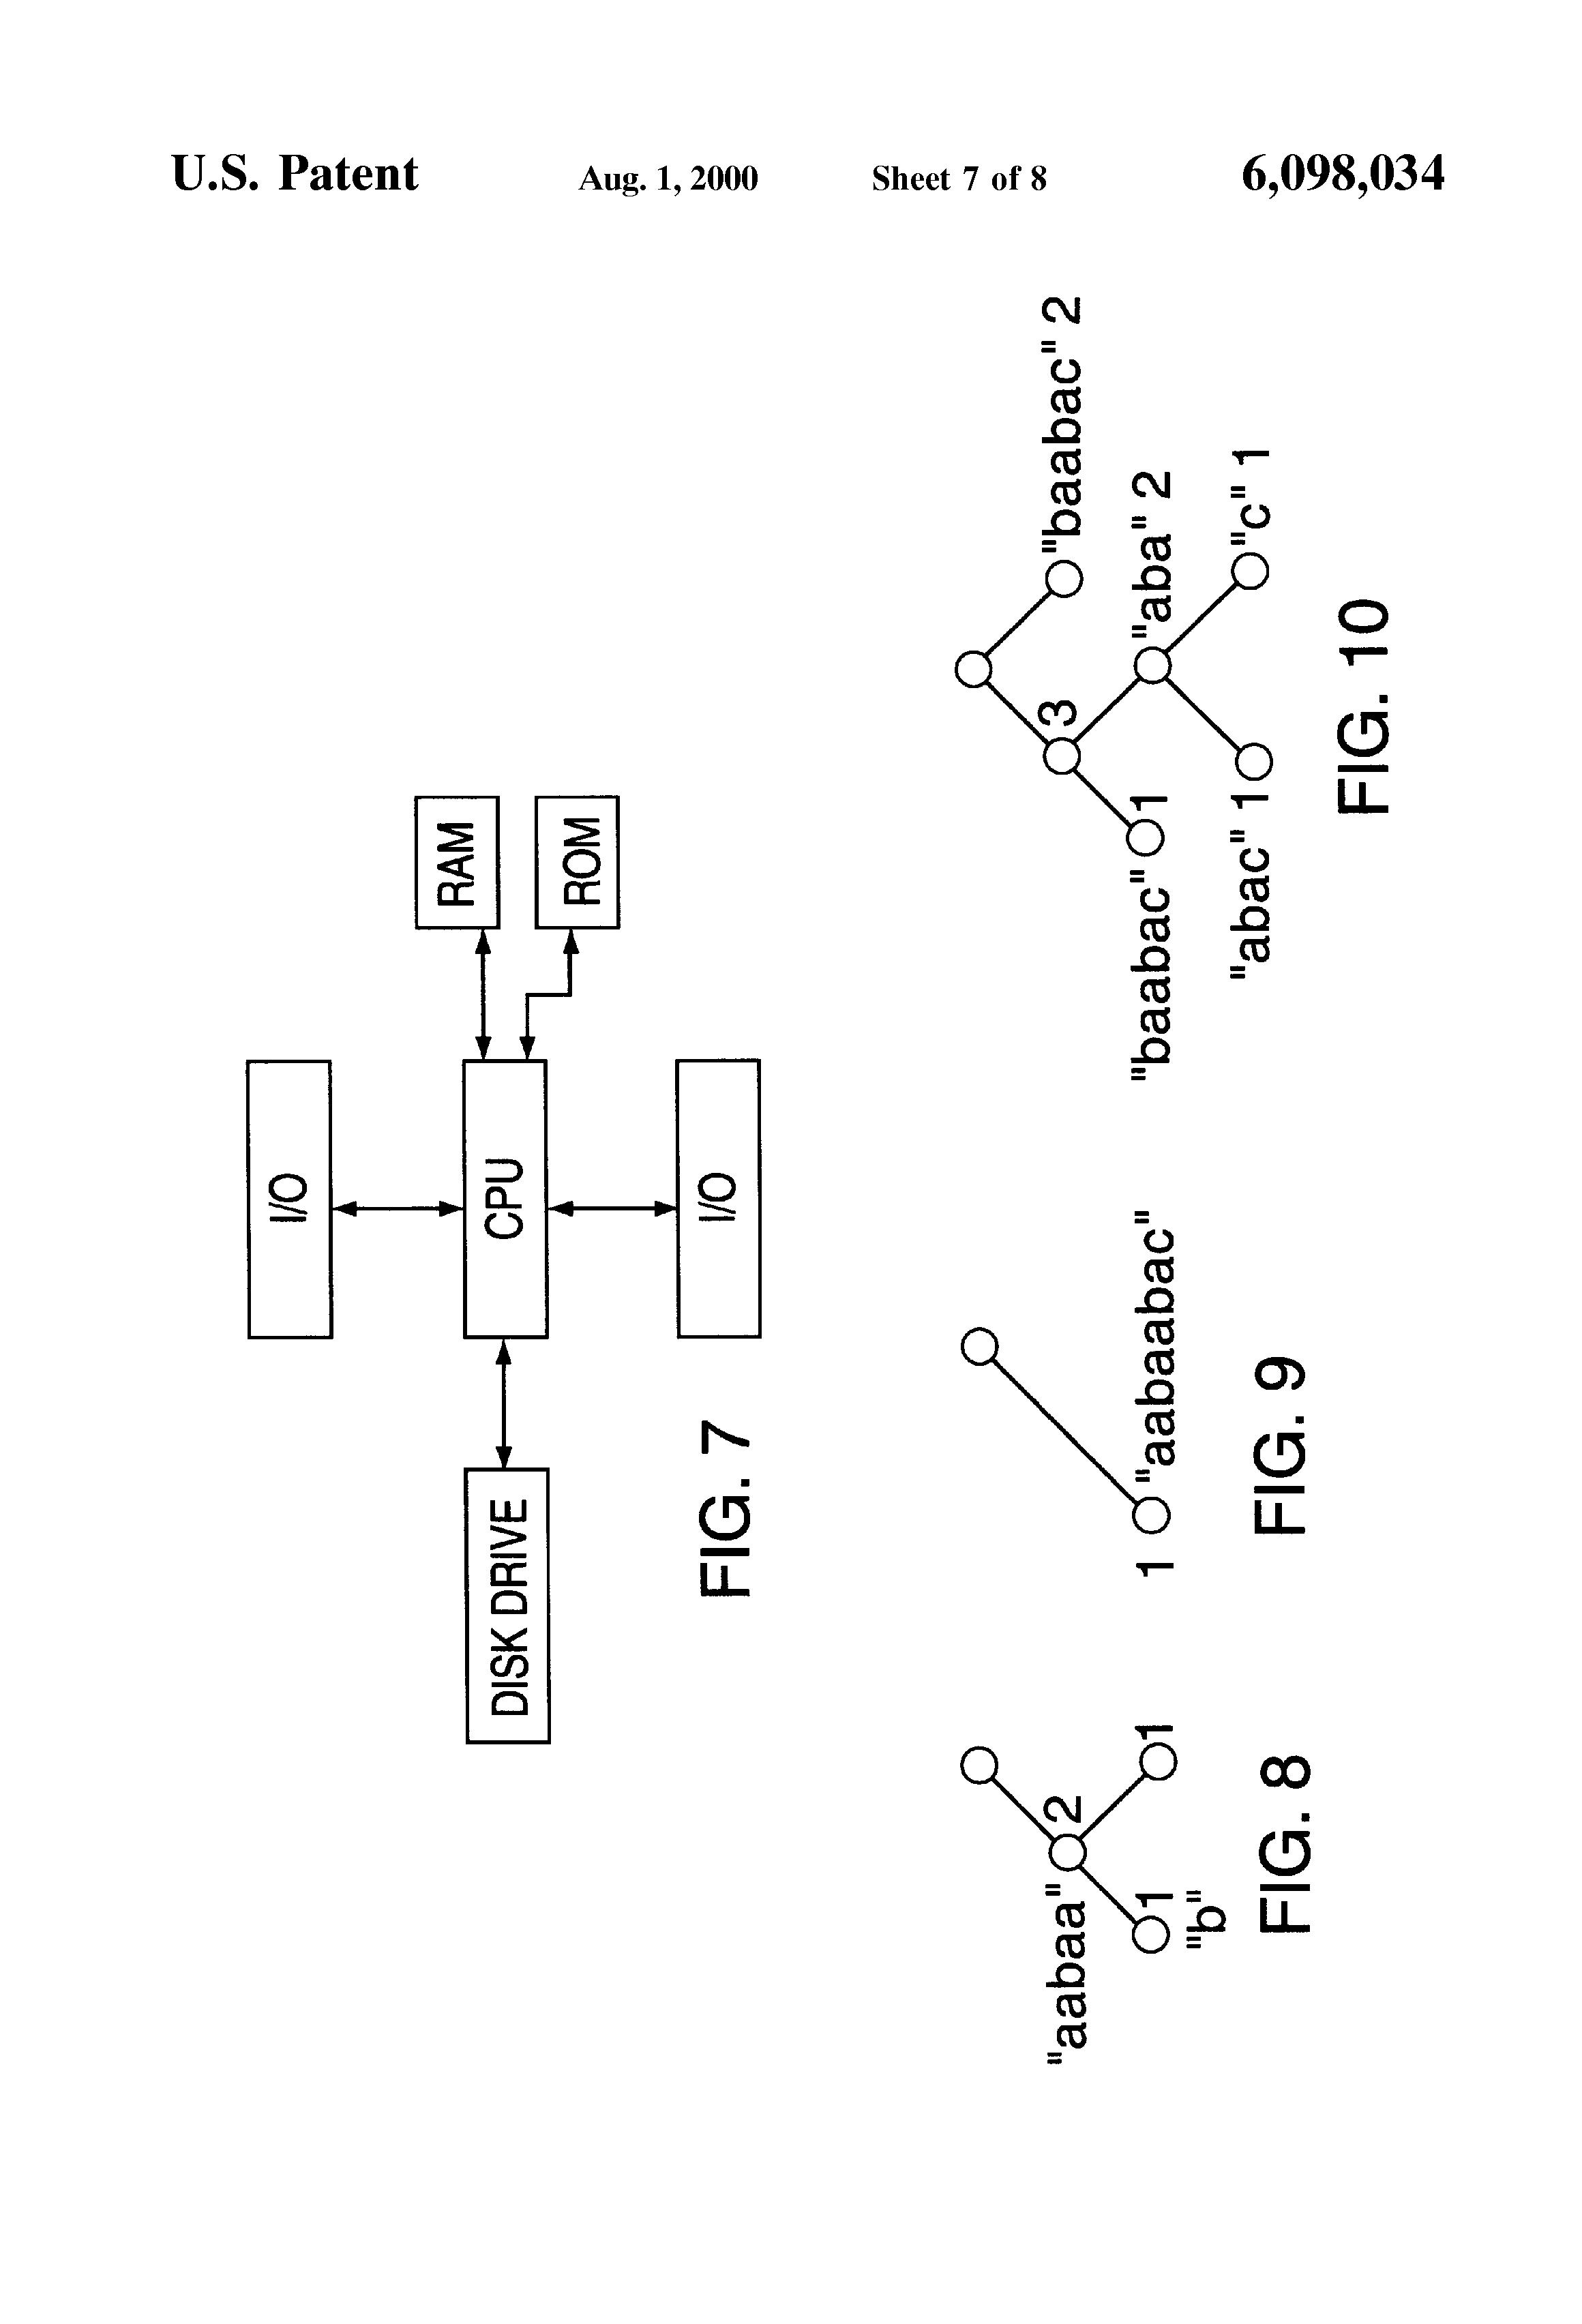 Patent Us6098034 Method For Standardizing Phrasing In A Document B C Logic Diagram Drawing